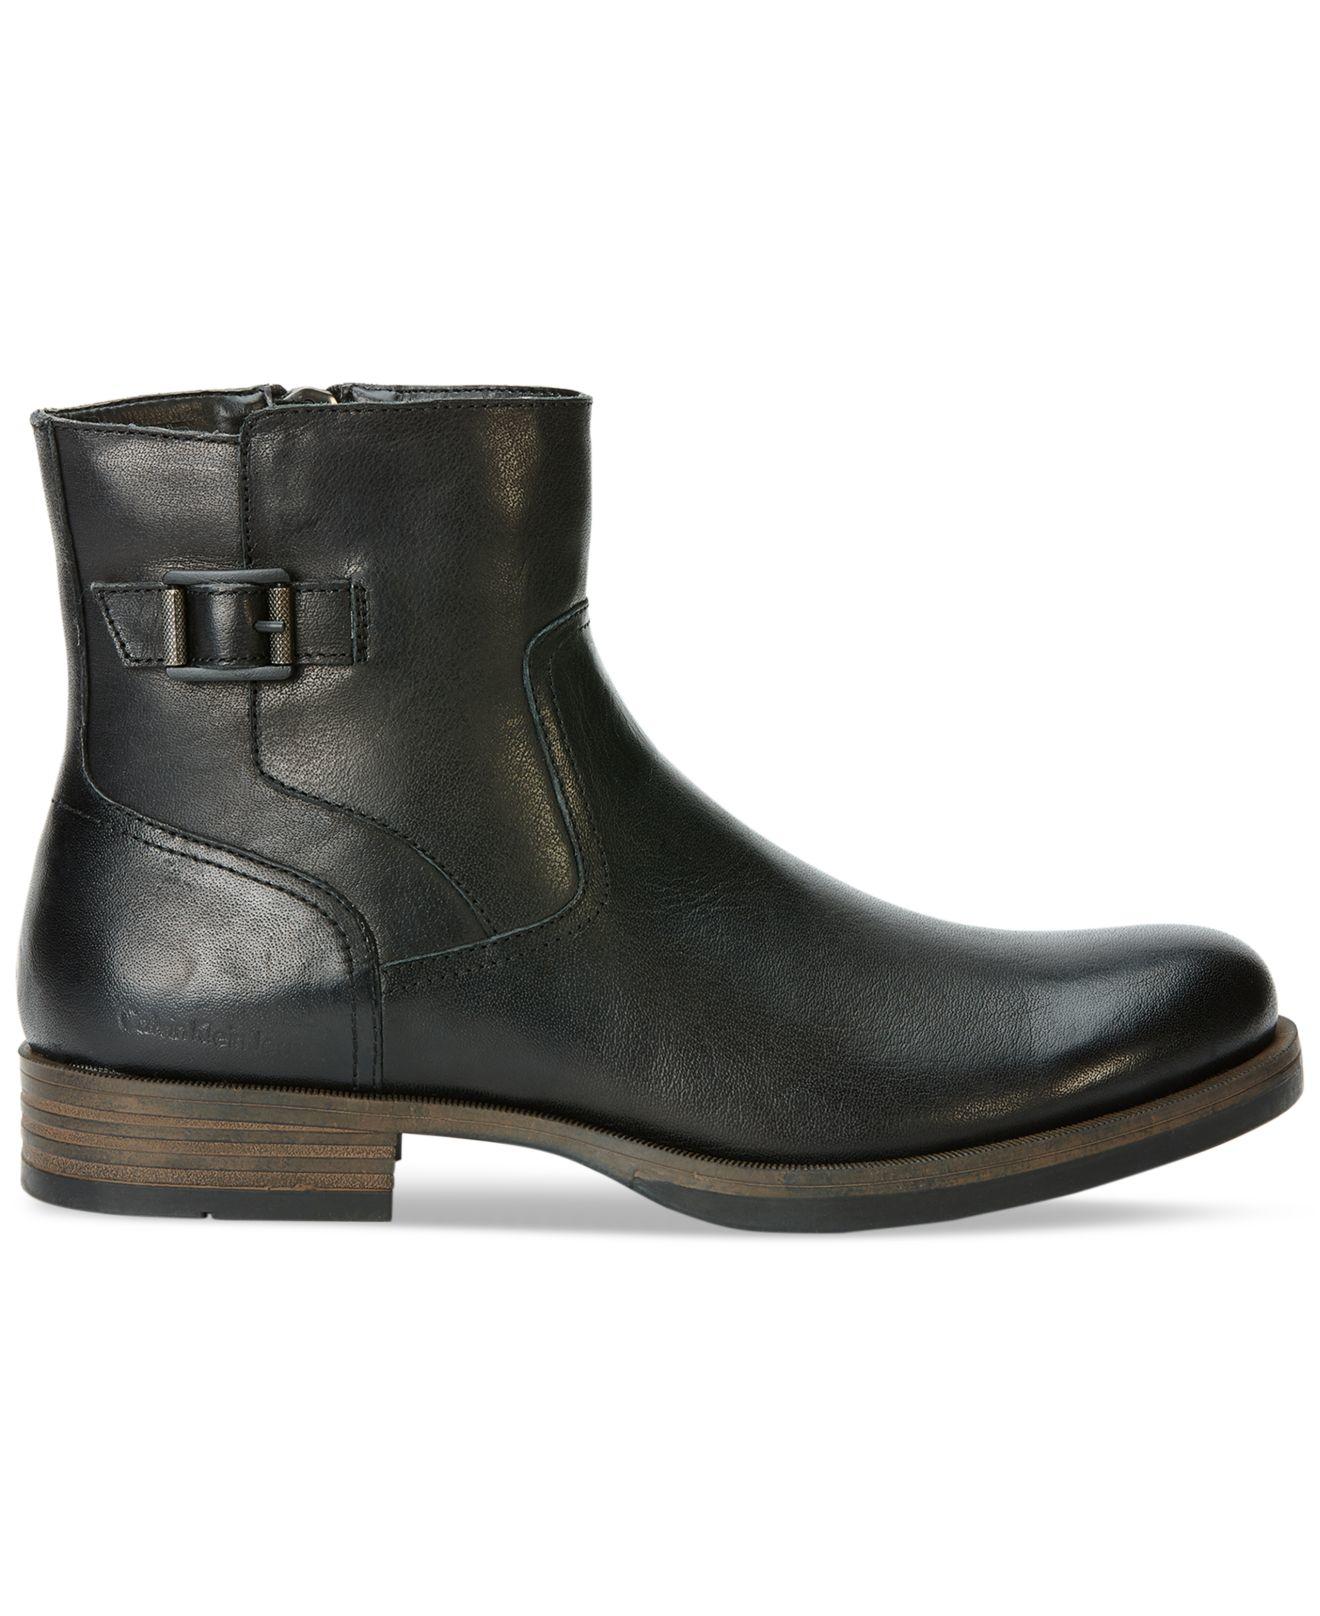 Calvin klein jeans Calving Klein Jeans Helix Chelsea Boots ...